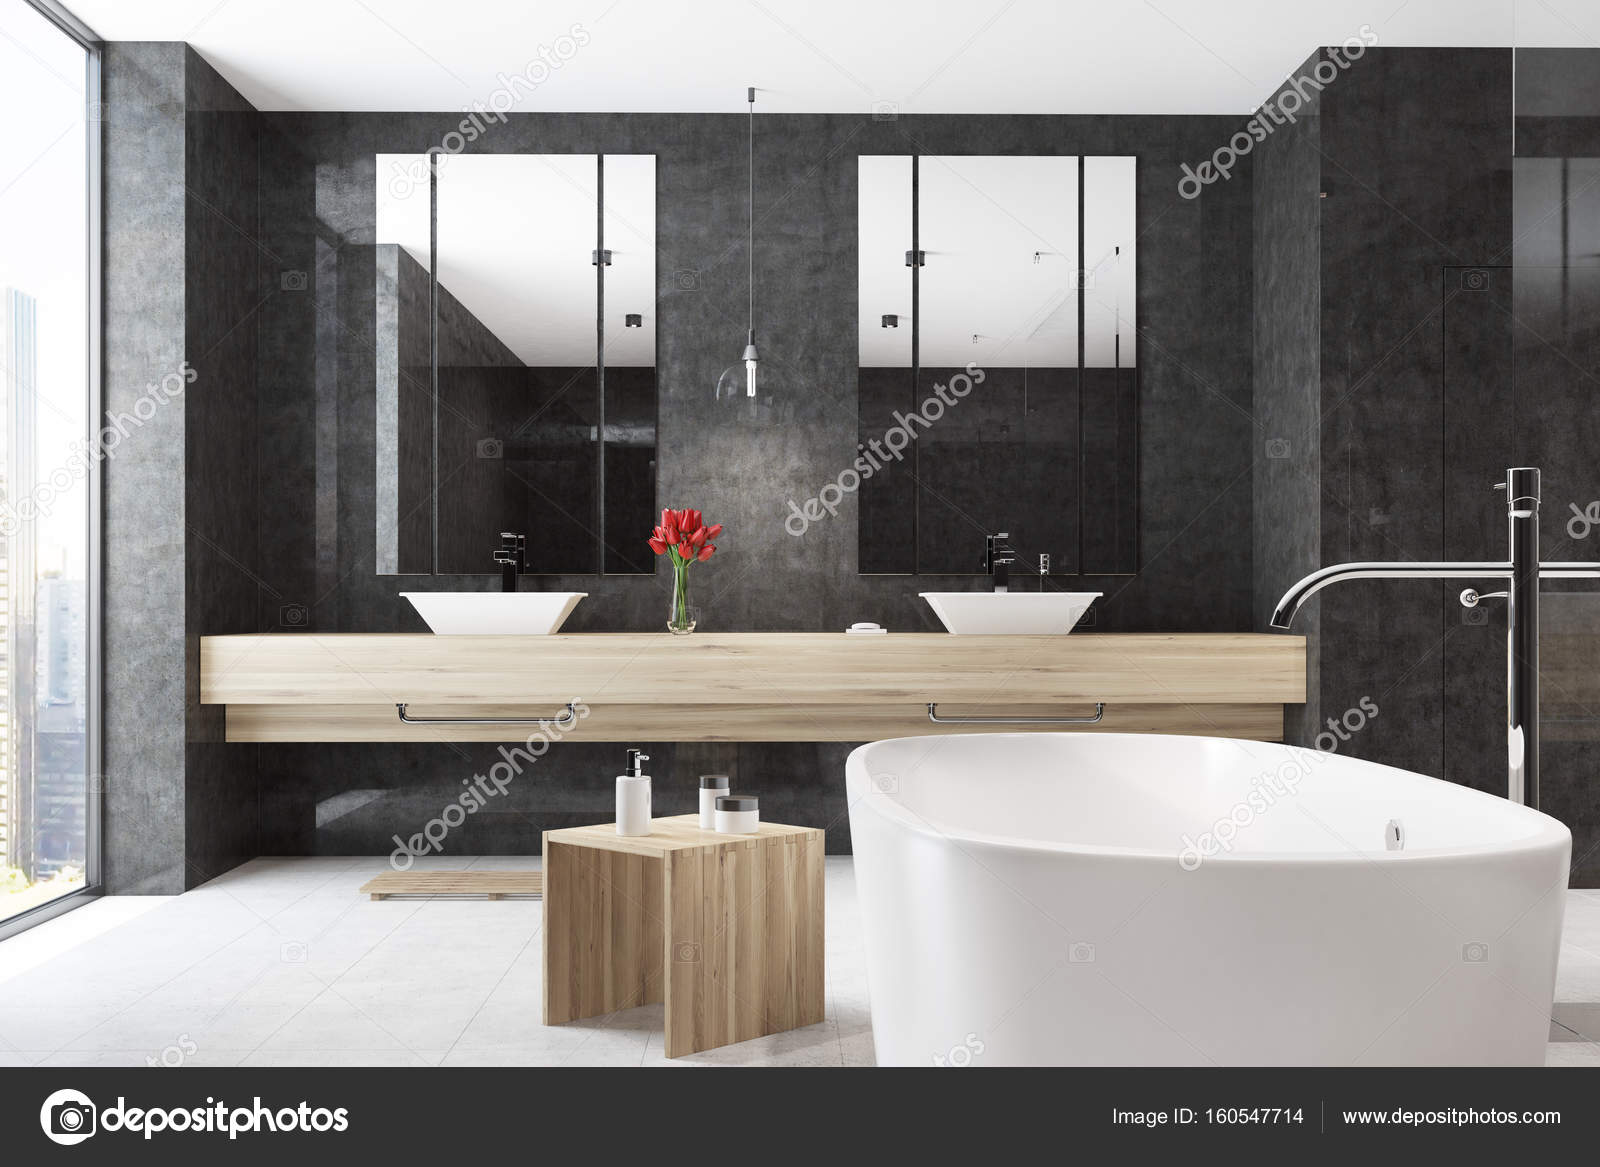 Frameworks voor de badkamer